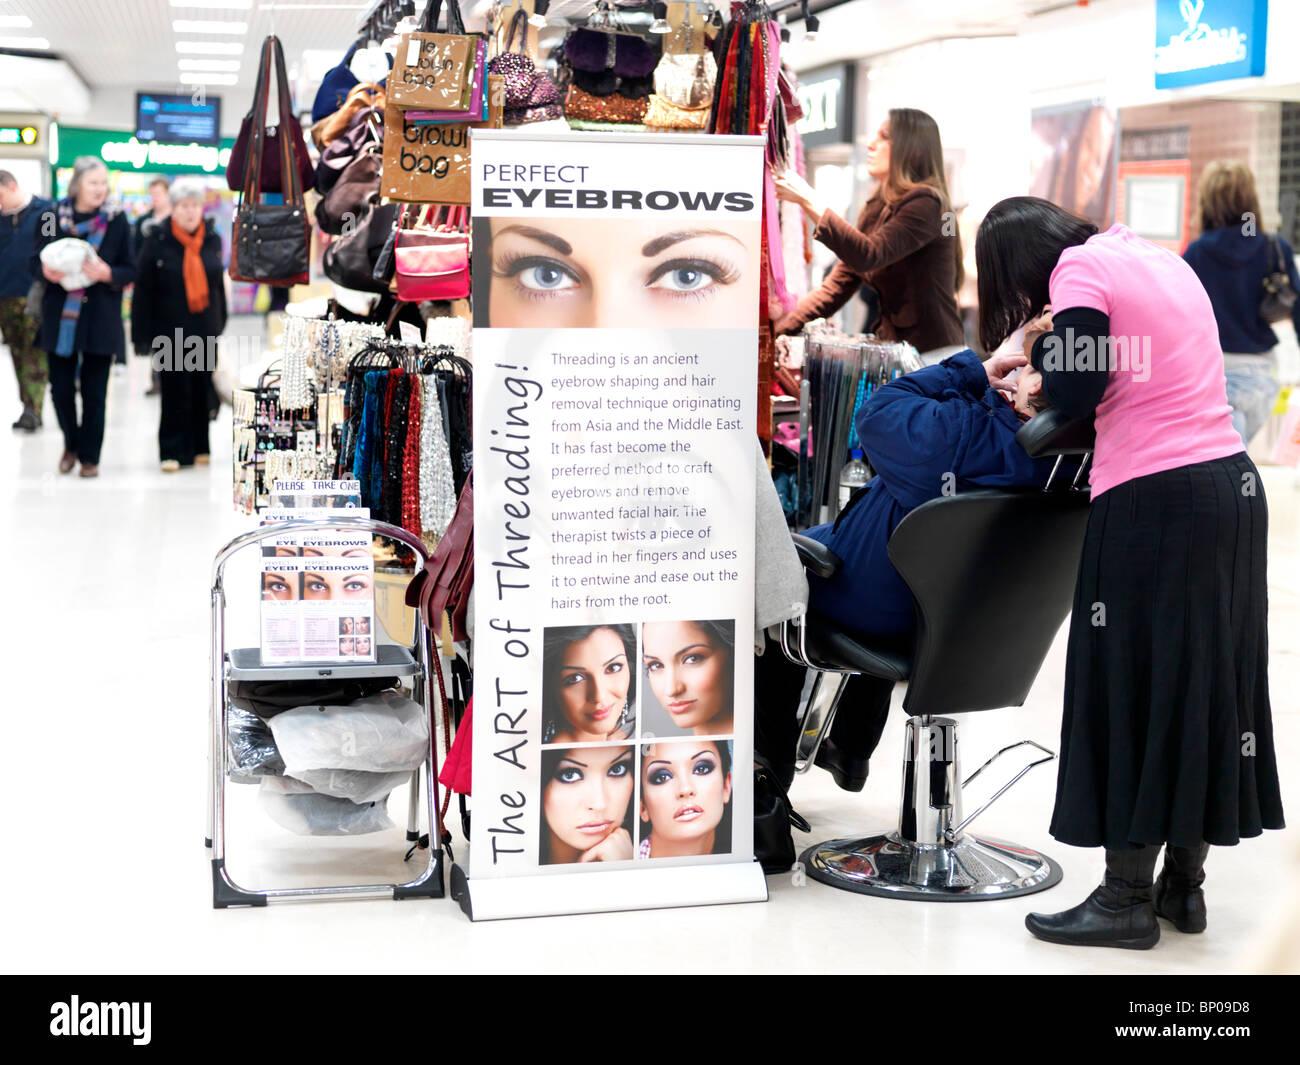 Eyebrow Threading Stock Photos & Eyebrow Threading Stock Images ...